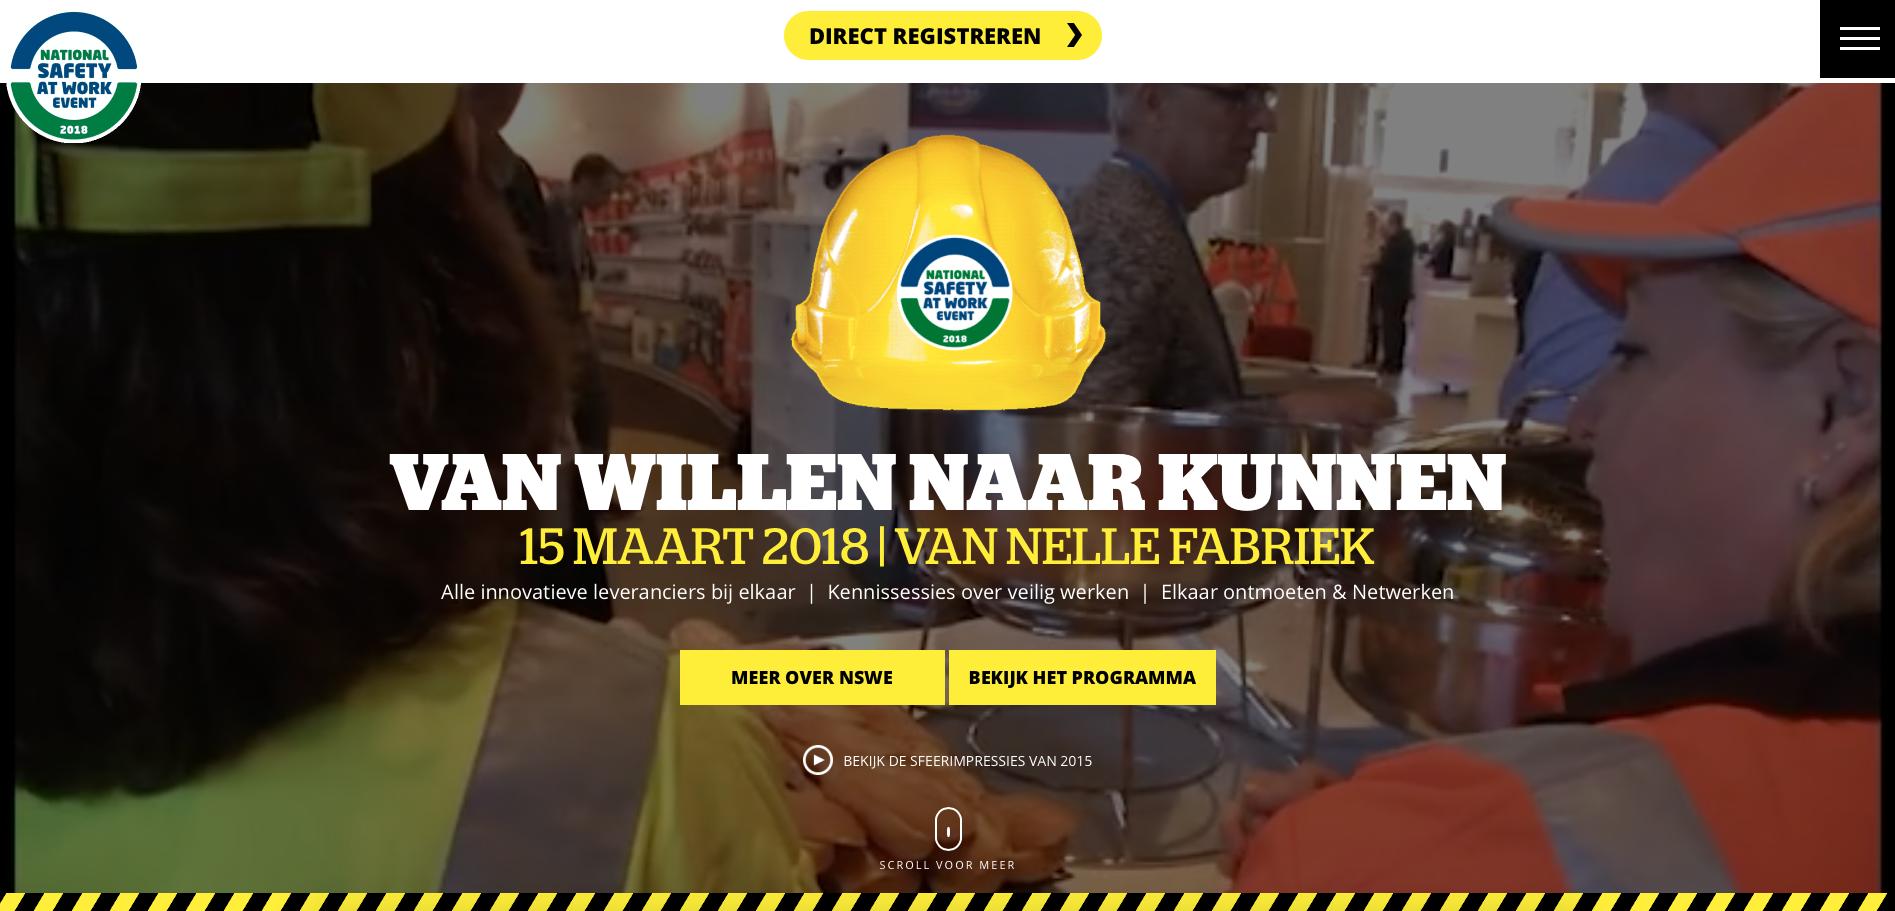 www.nswe.nl live!